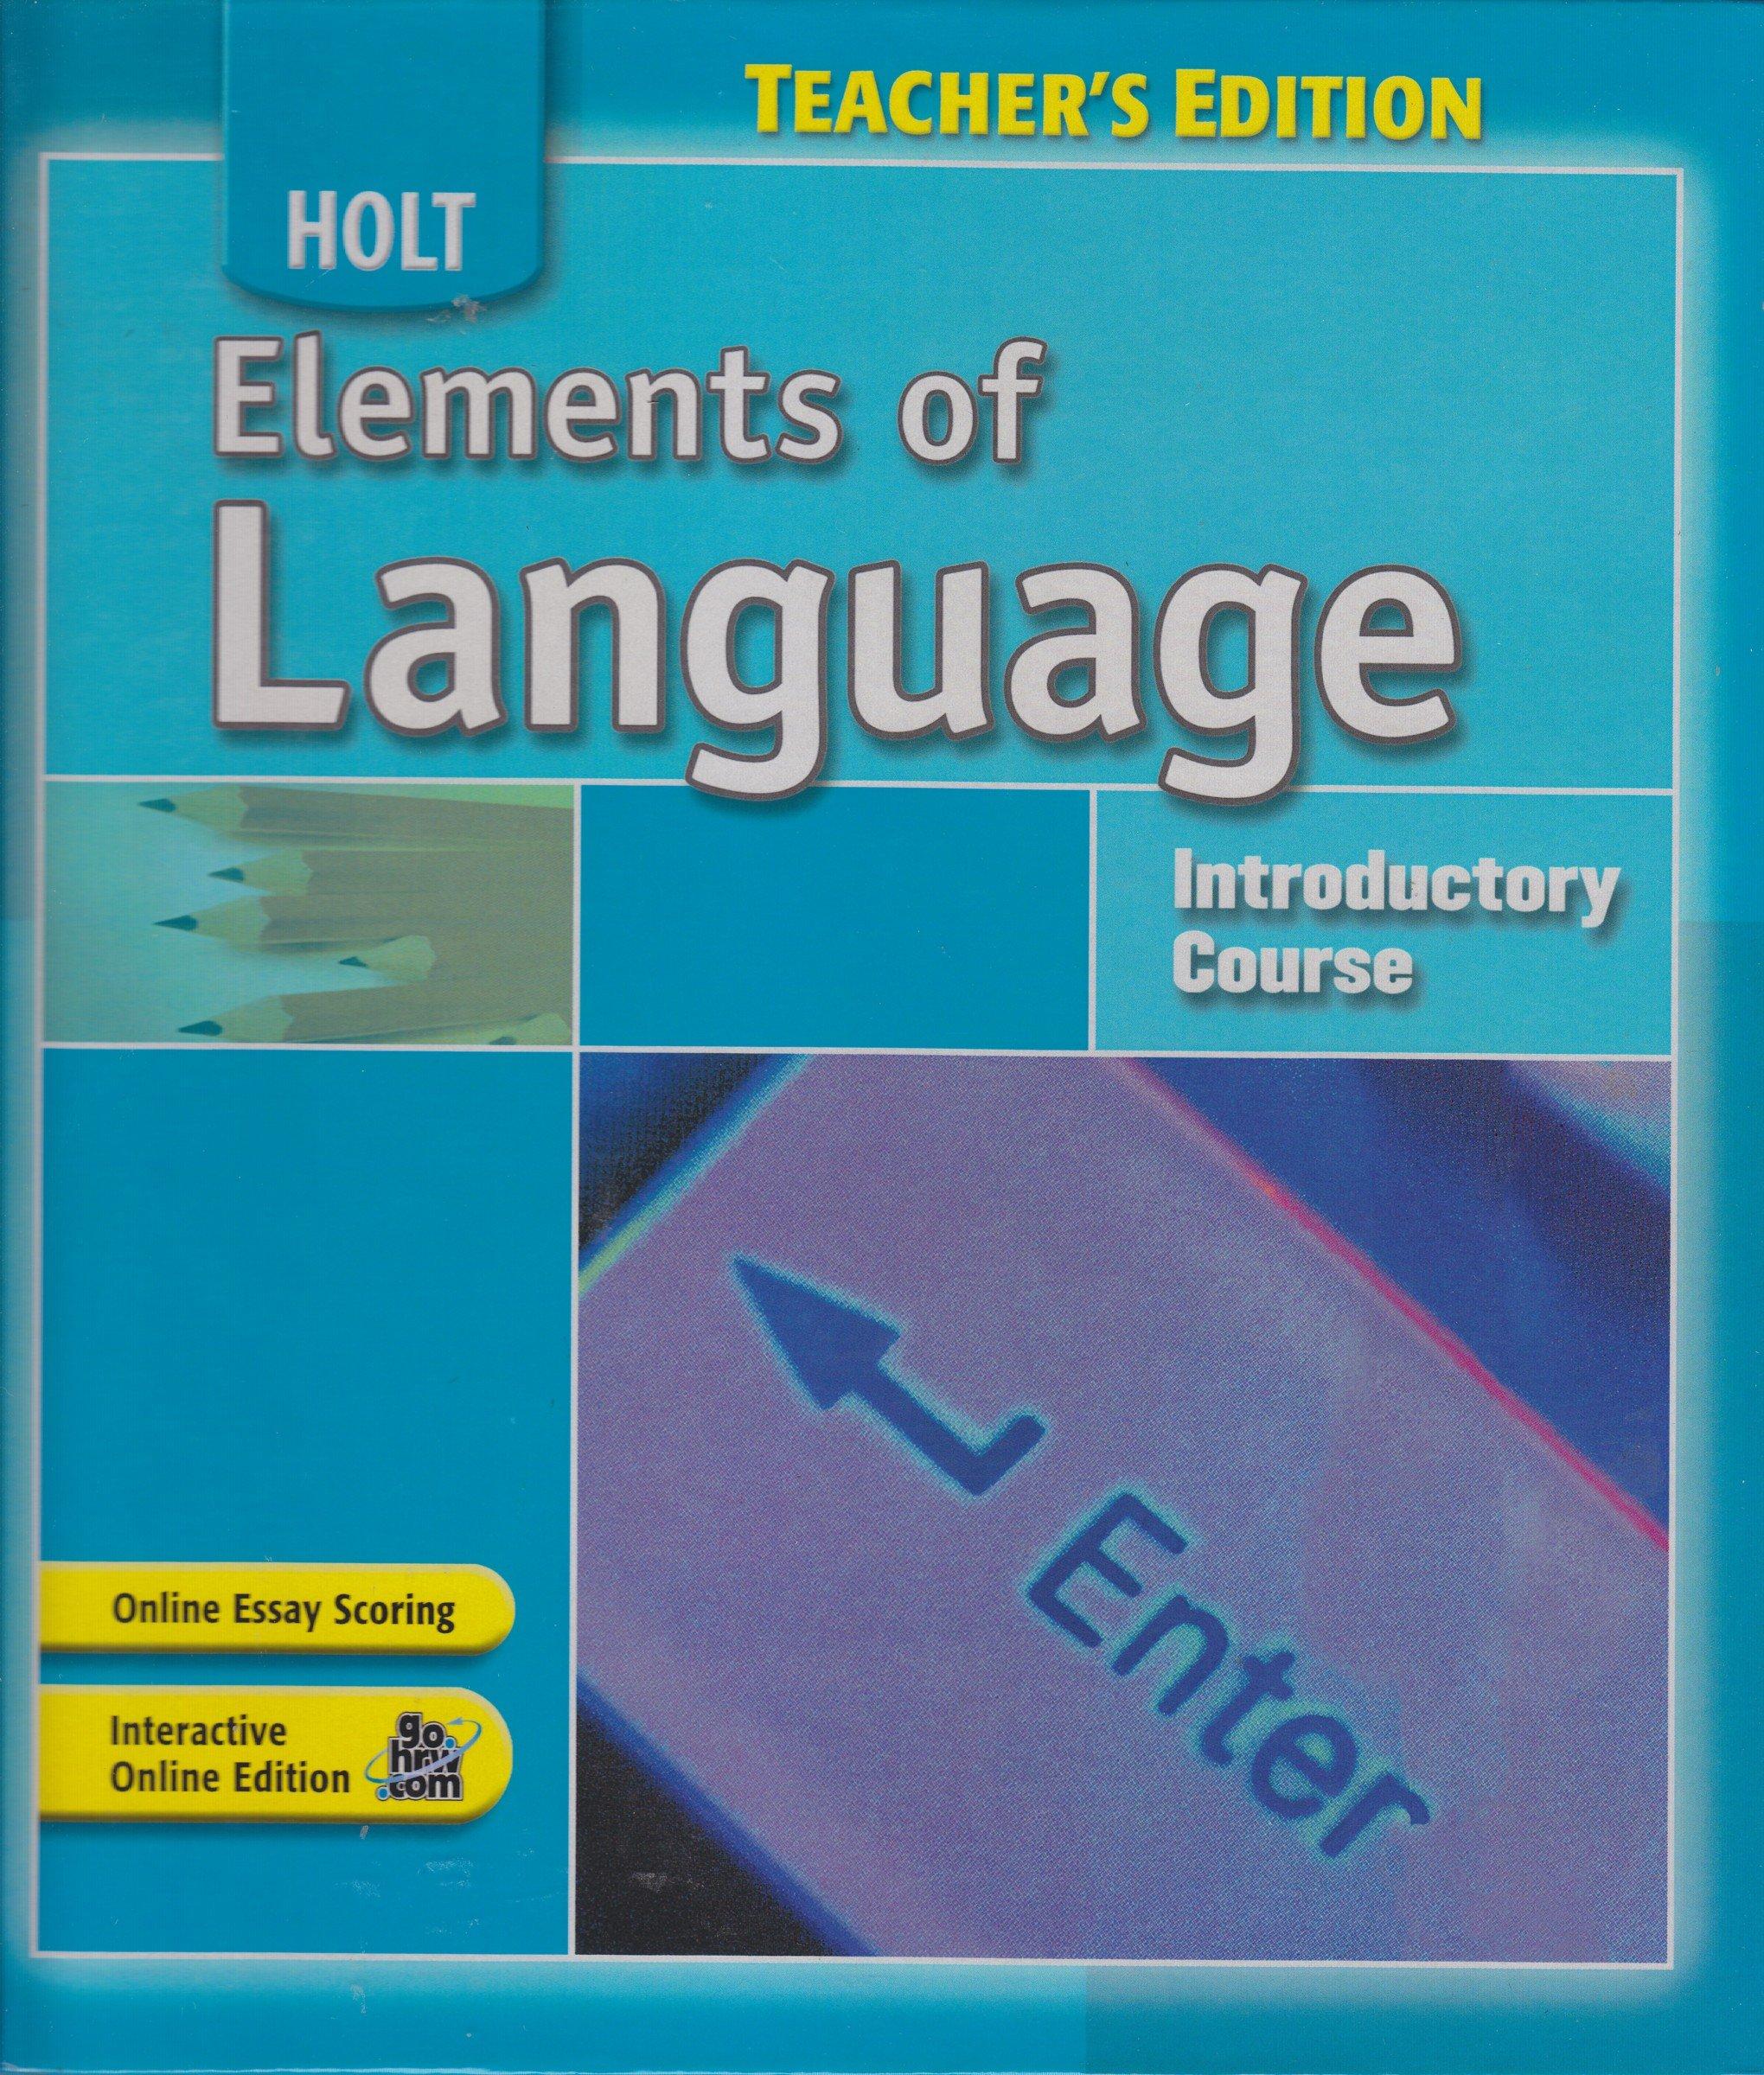 Holt elements of language teachers edition introductory course holt elements of language teachers edition introductory course et al lee odell 9780030796869 amazon books fandeluxe Choice Image